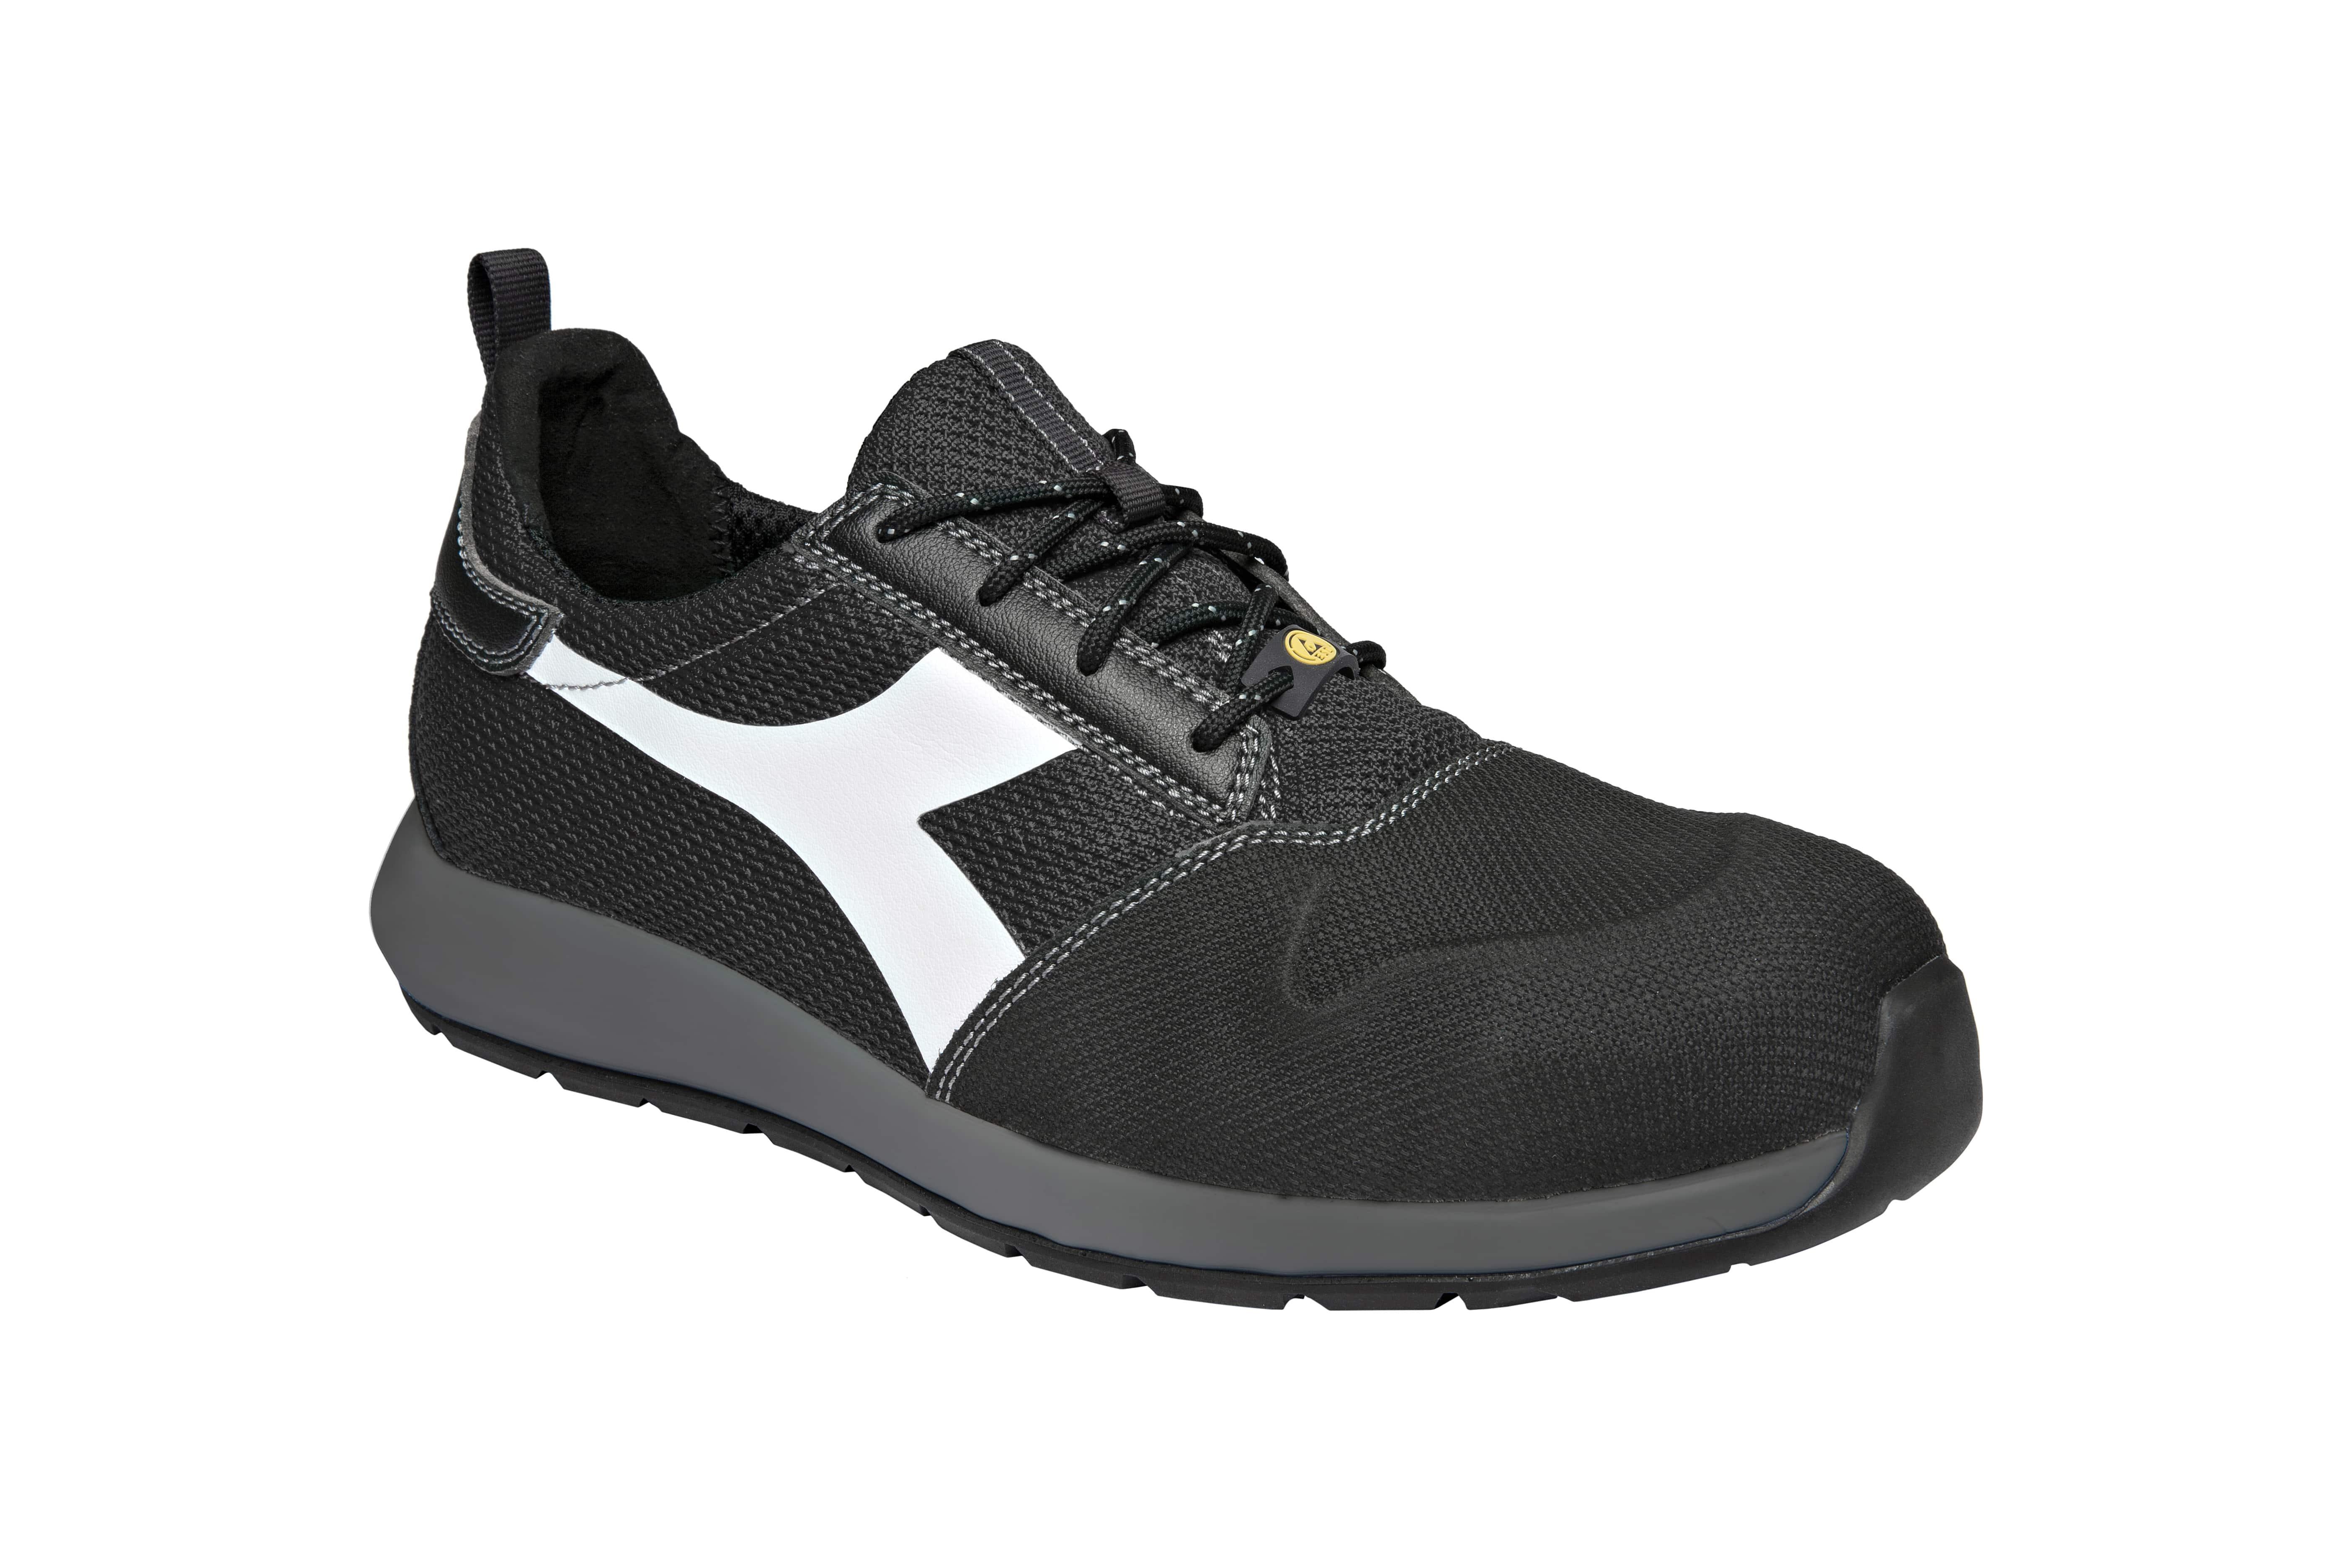 cb0ab2f0a Diadora | Zapatillas de seguridad | Calzado de Protección